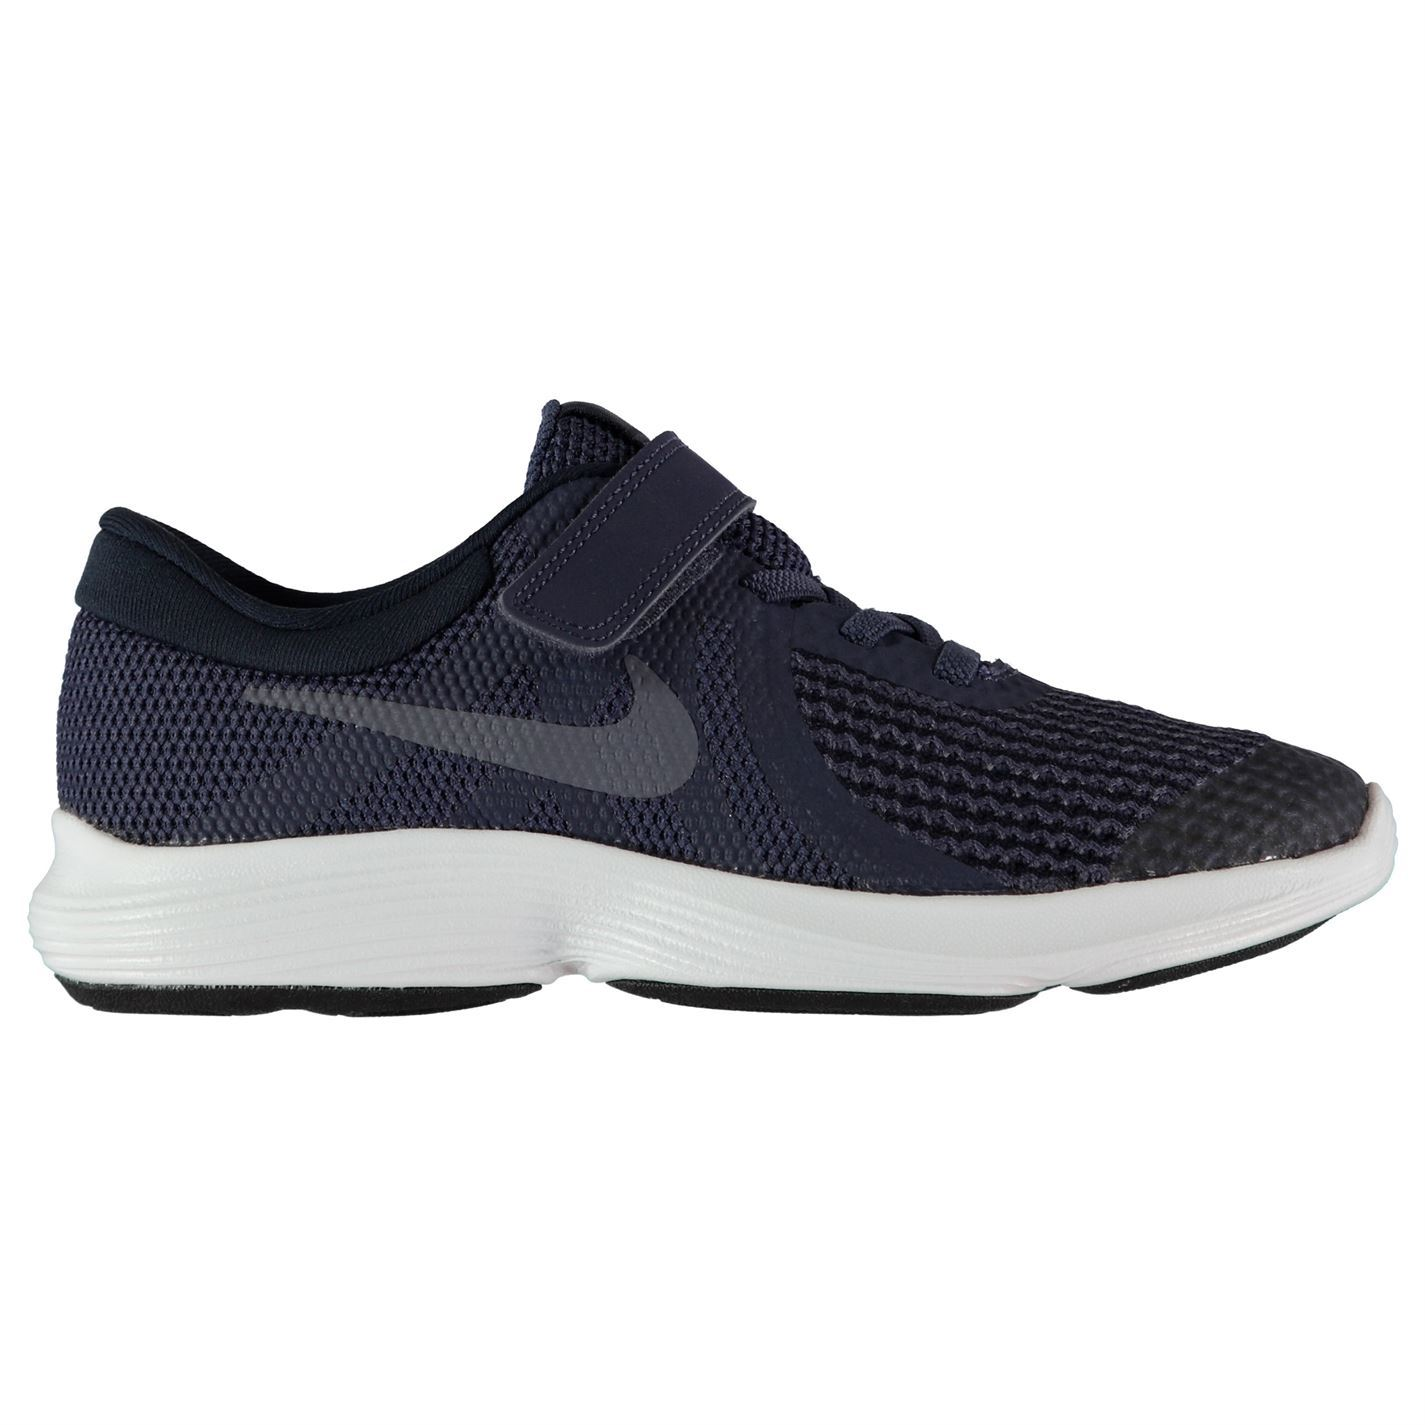 2453835ddeaf6 ... Nike Revolution 4 enfant garçons formateurs chaussures chaussures ...